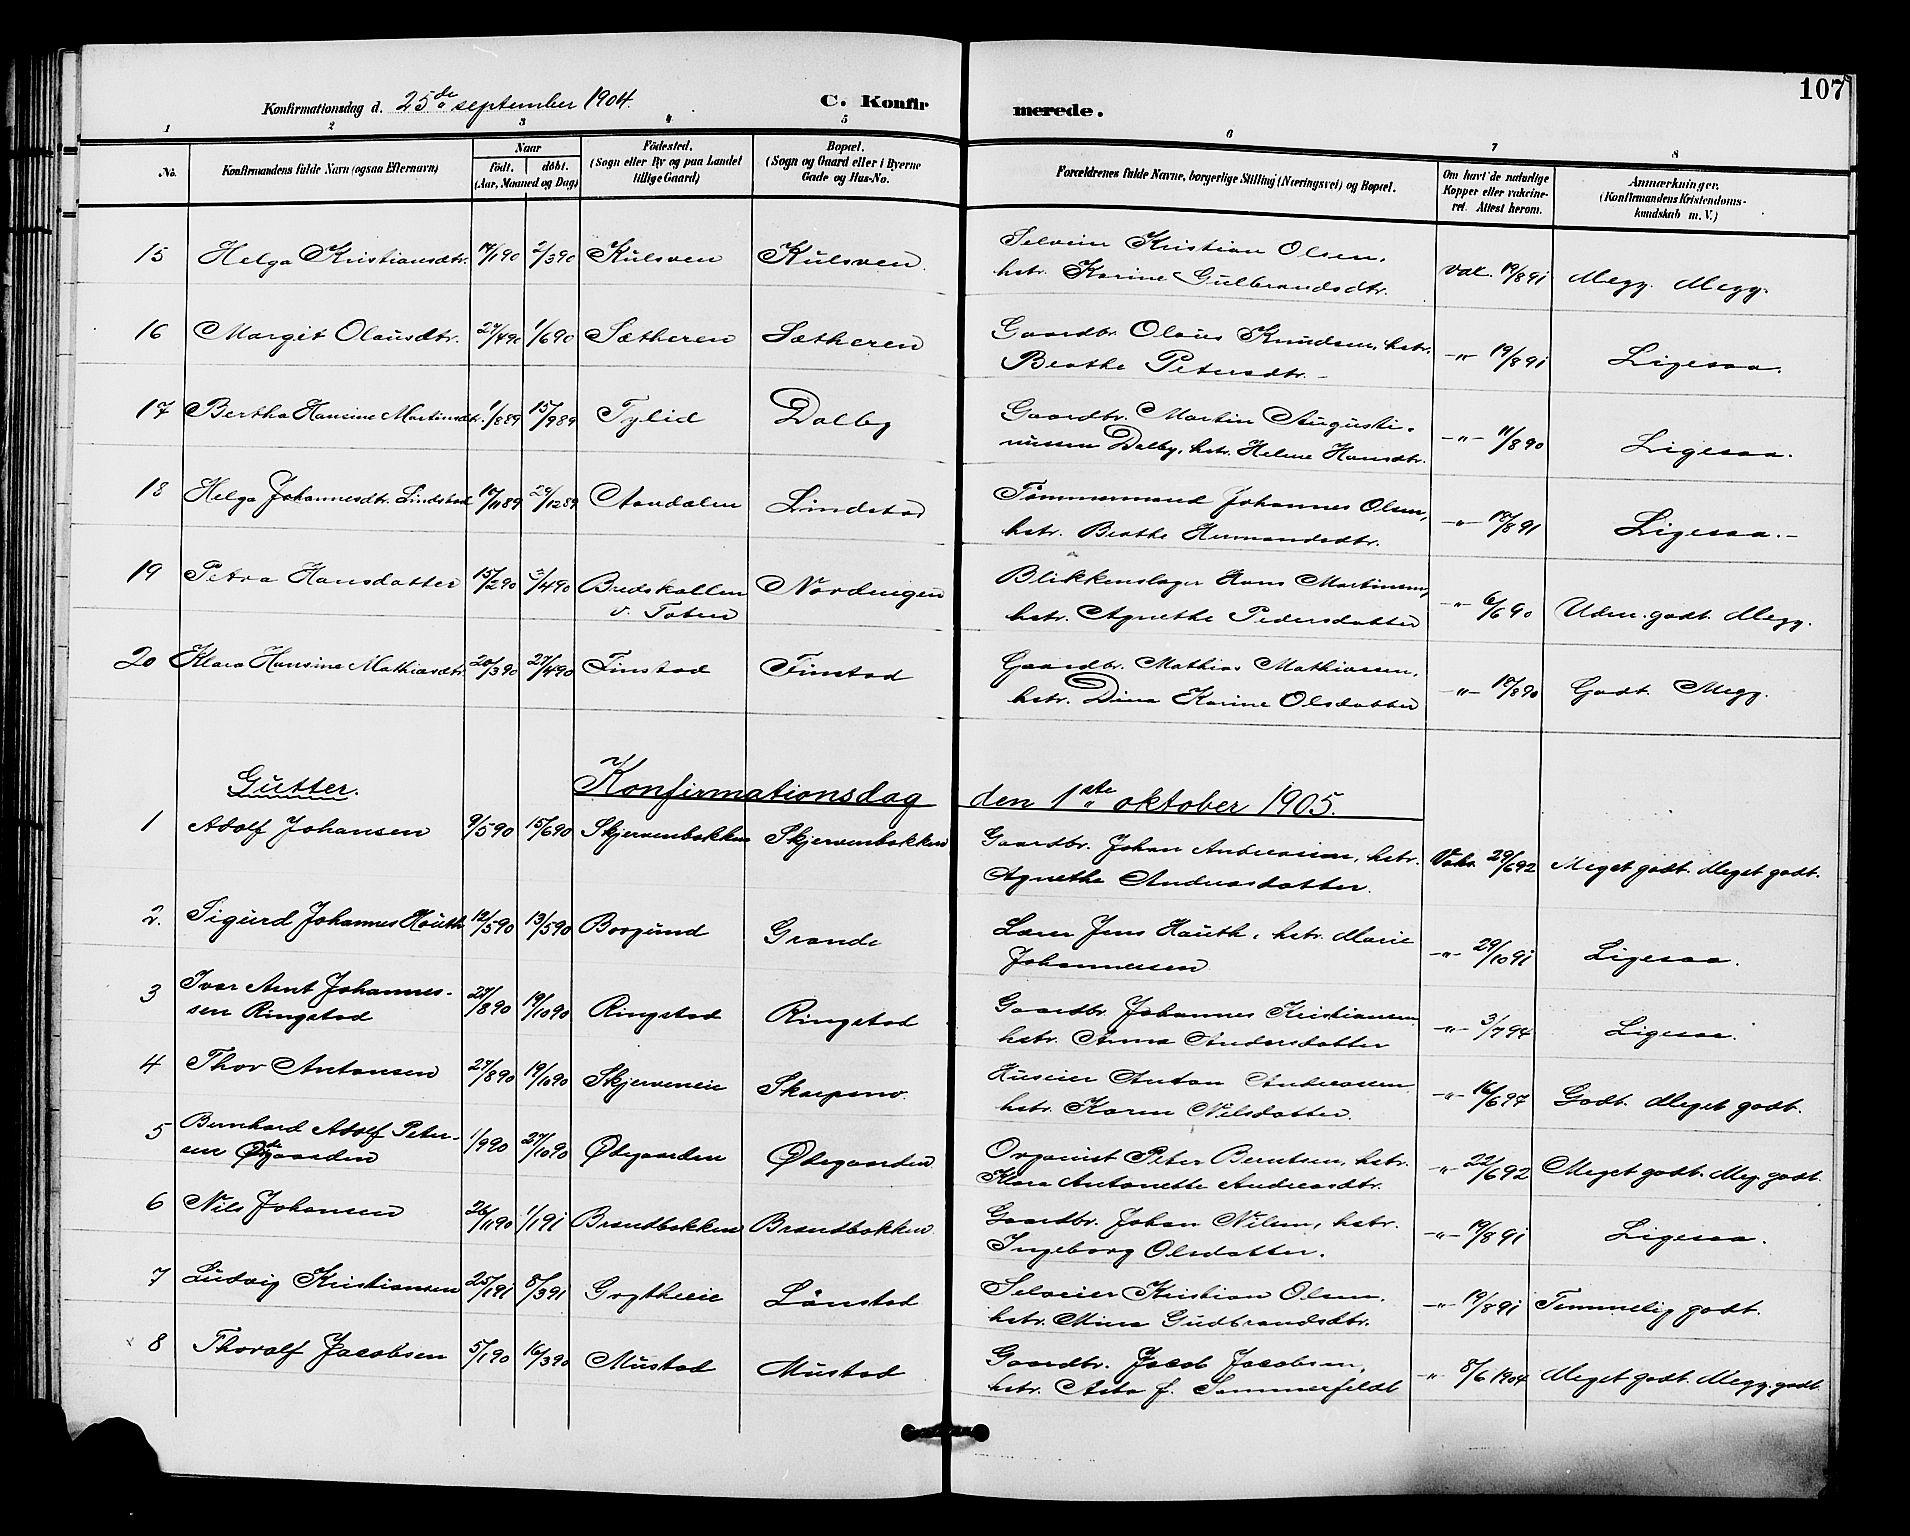 SAH, Vardal prestekontor, H/Ha/Hab/L0011: Klokkerbok nr. 11, 1899-1913, s. 107